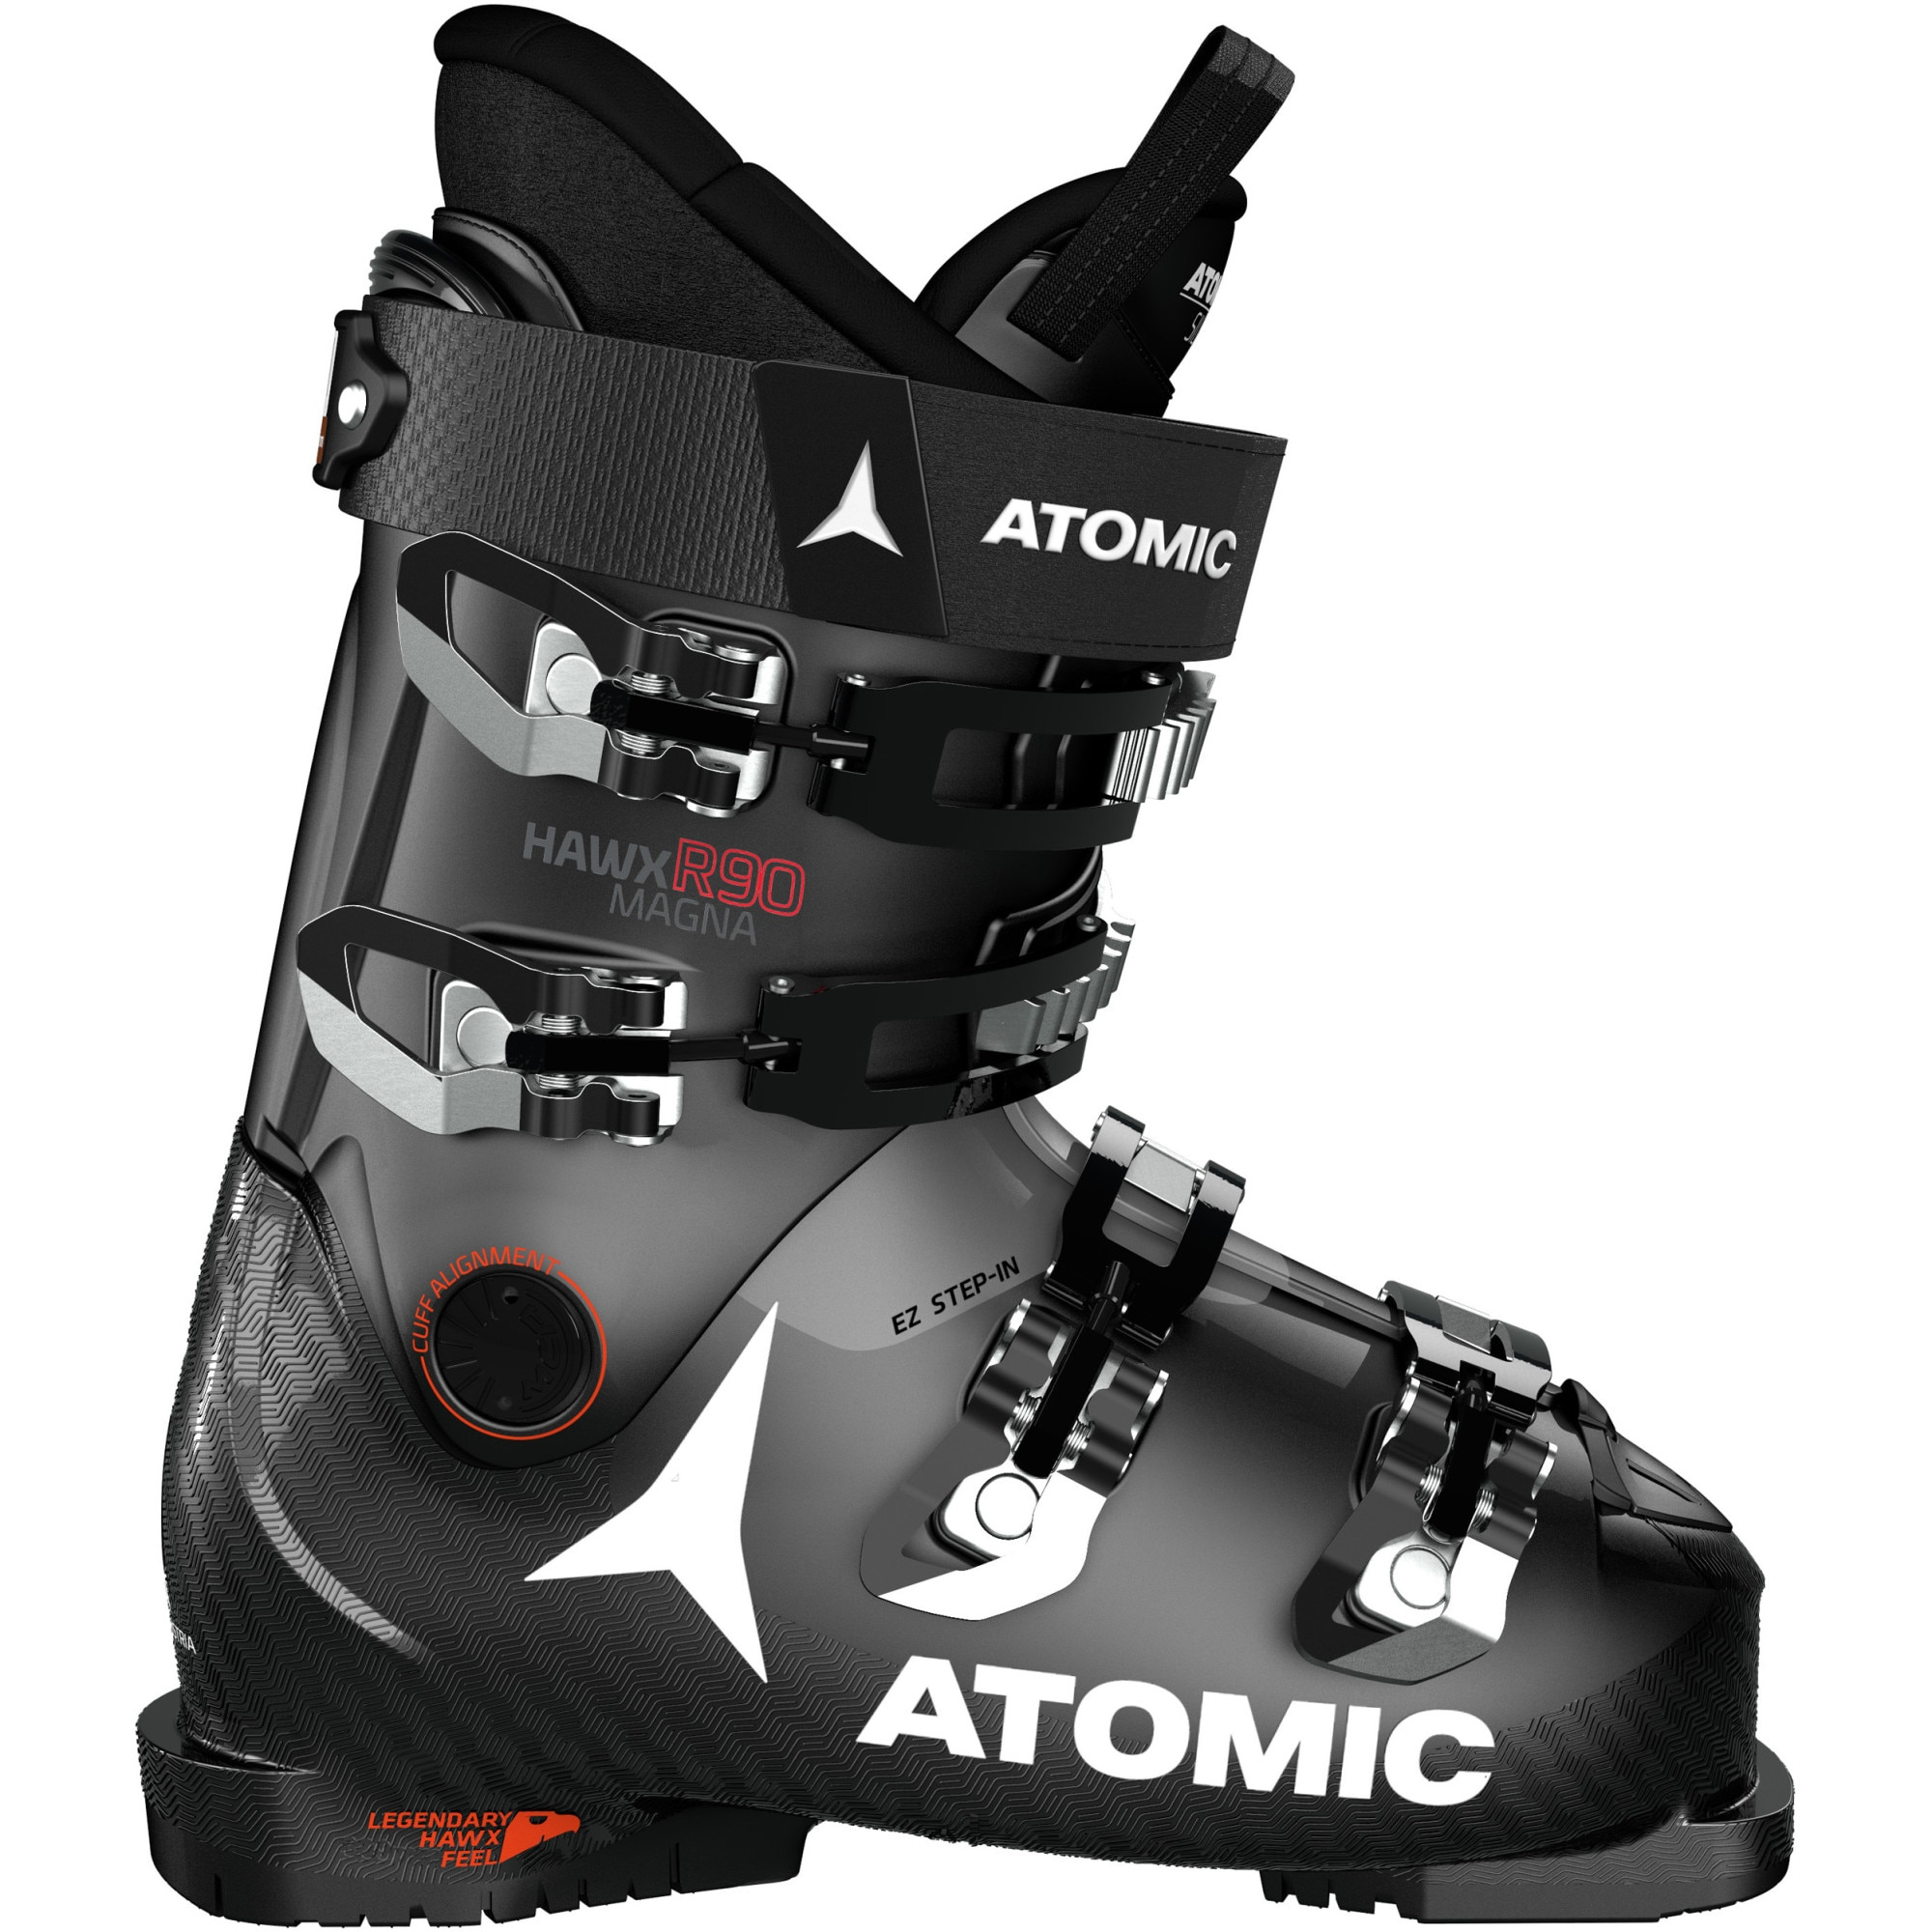 Fotografie Clapari ski Atomic Hawx Magna R90,Barbati,Negru/Gri,30/30.5